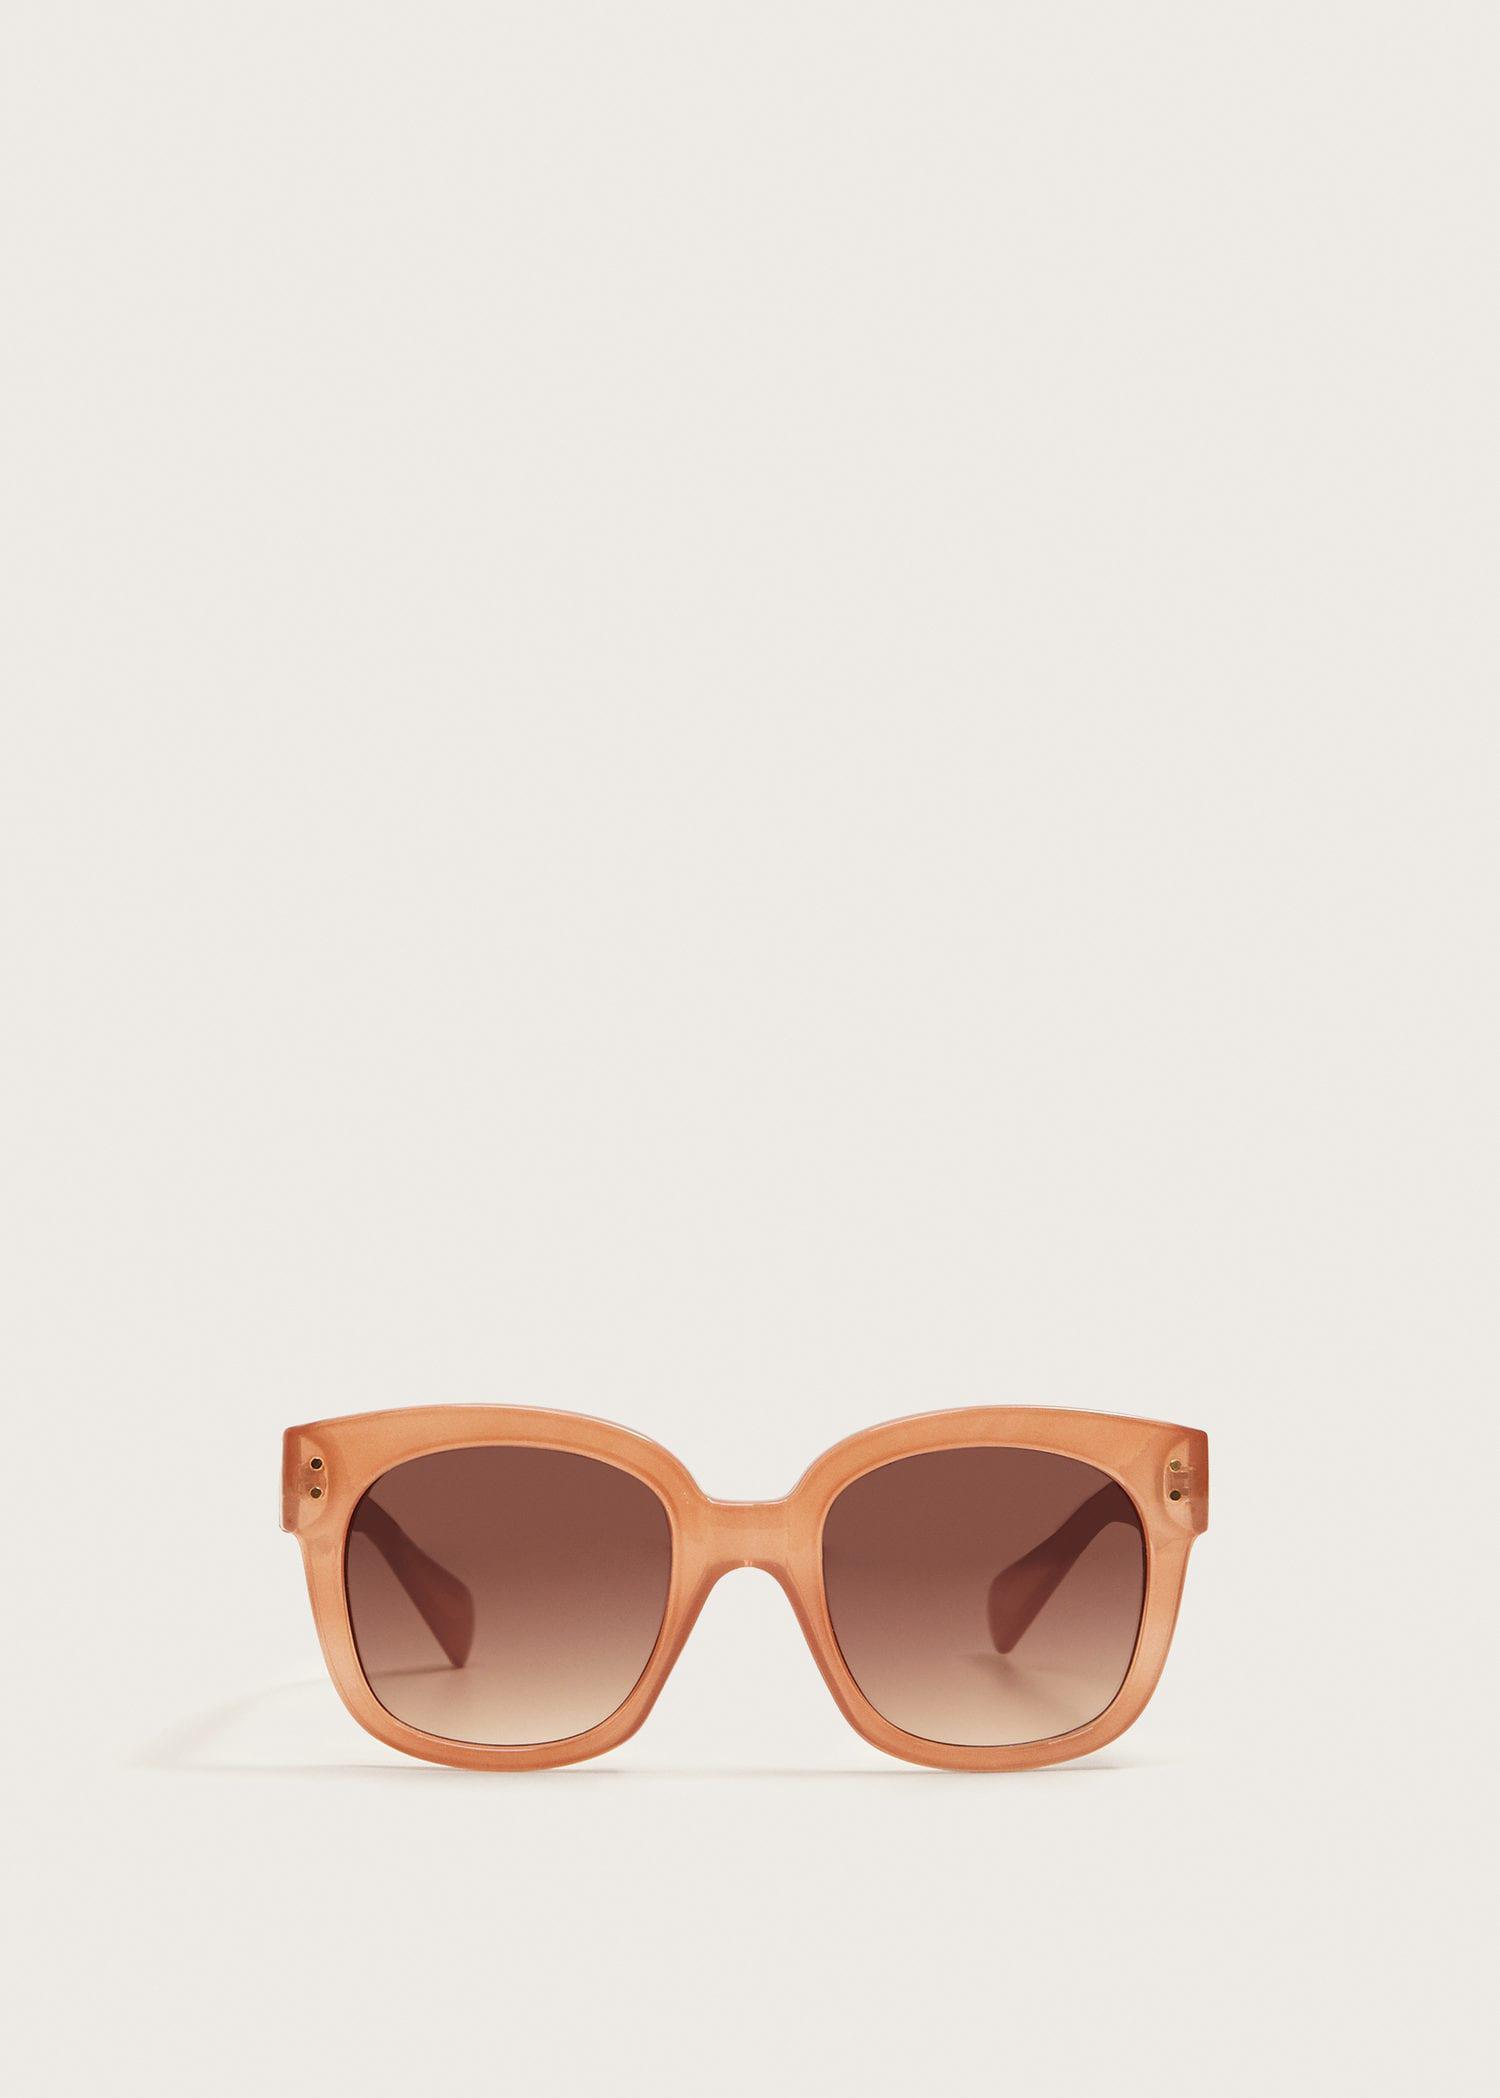 Lyst - Violeta By Mango Acetate Frame Sunglasses in Pink